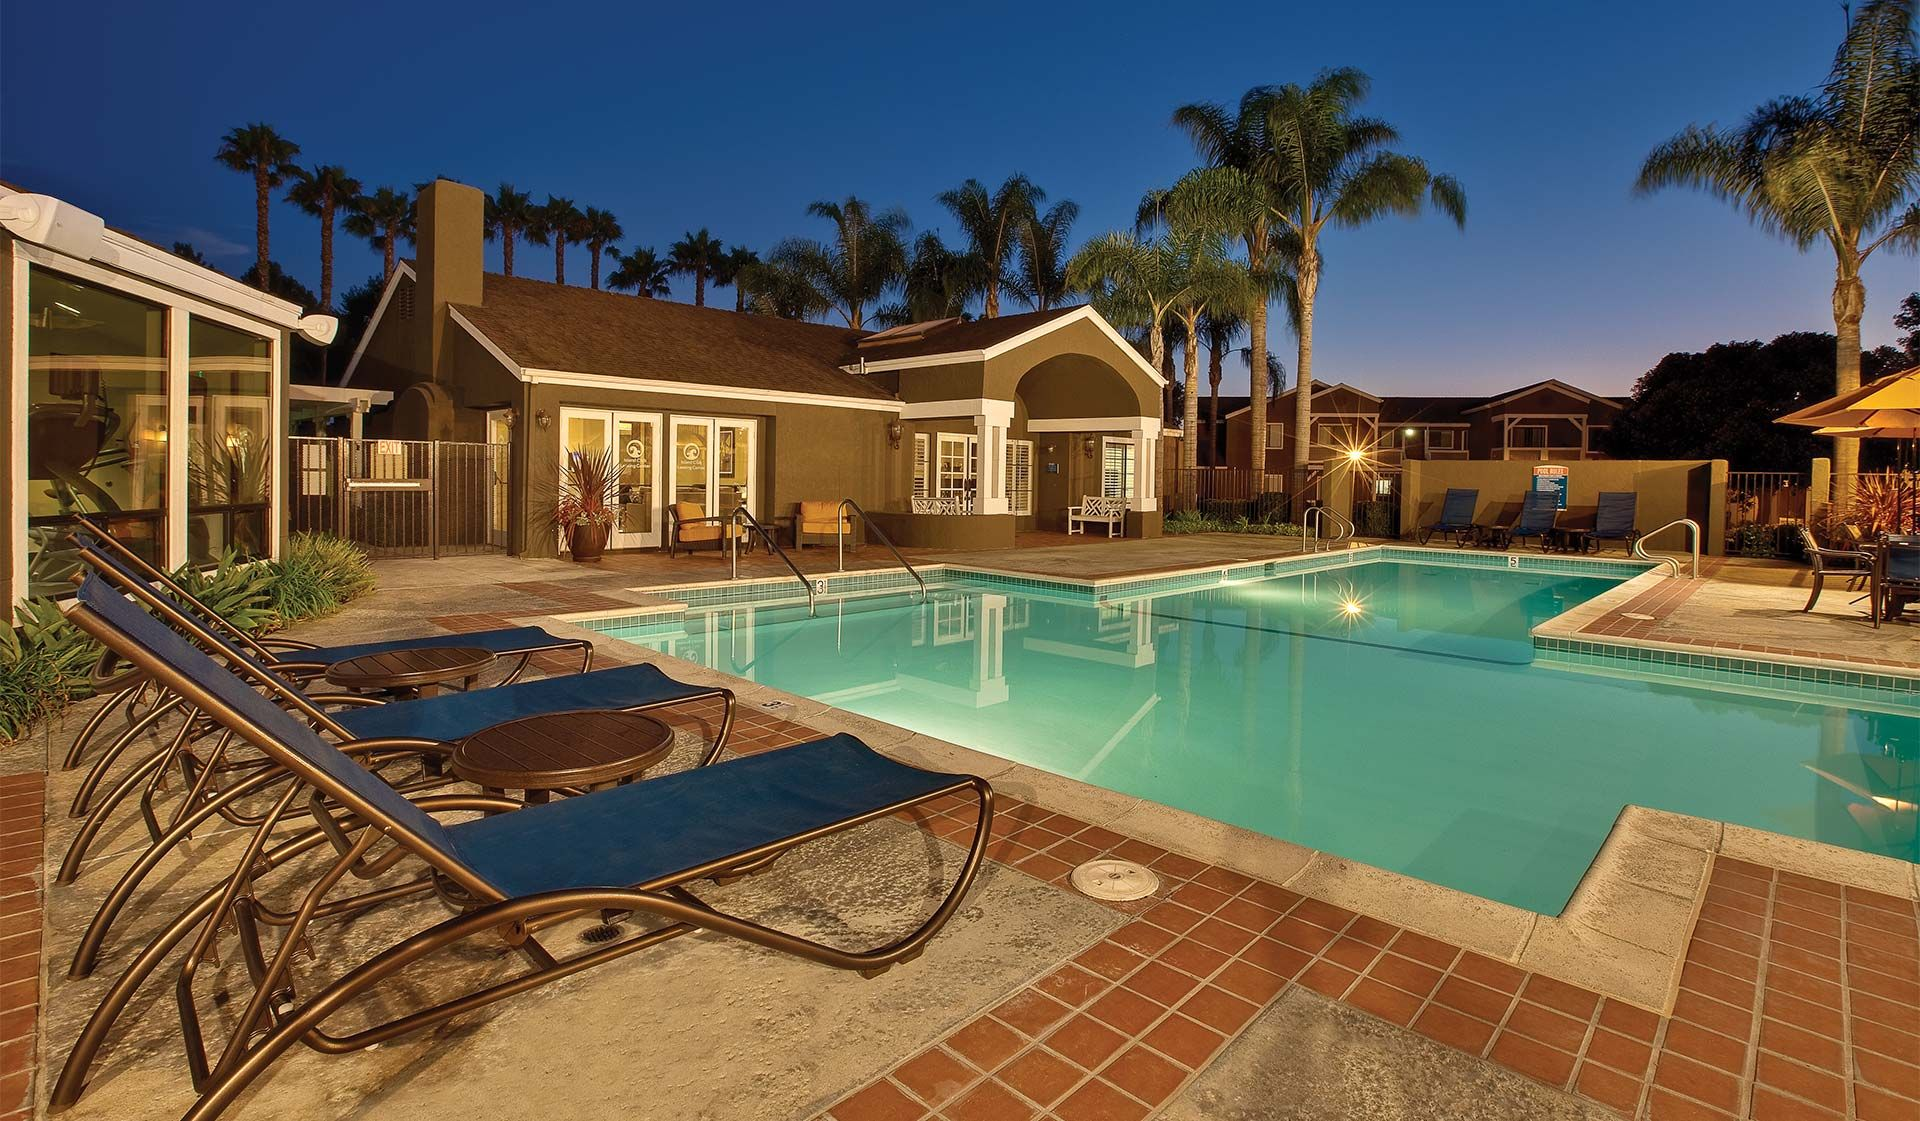 Island club apartment homes dream backyard oceanside home